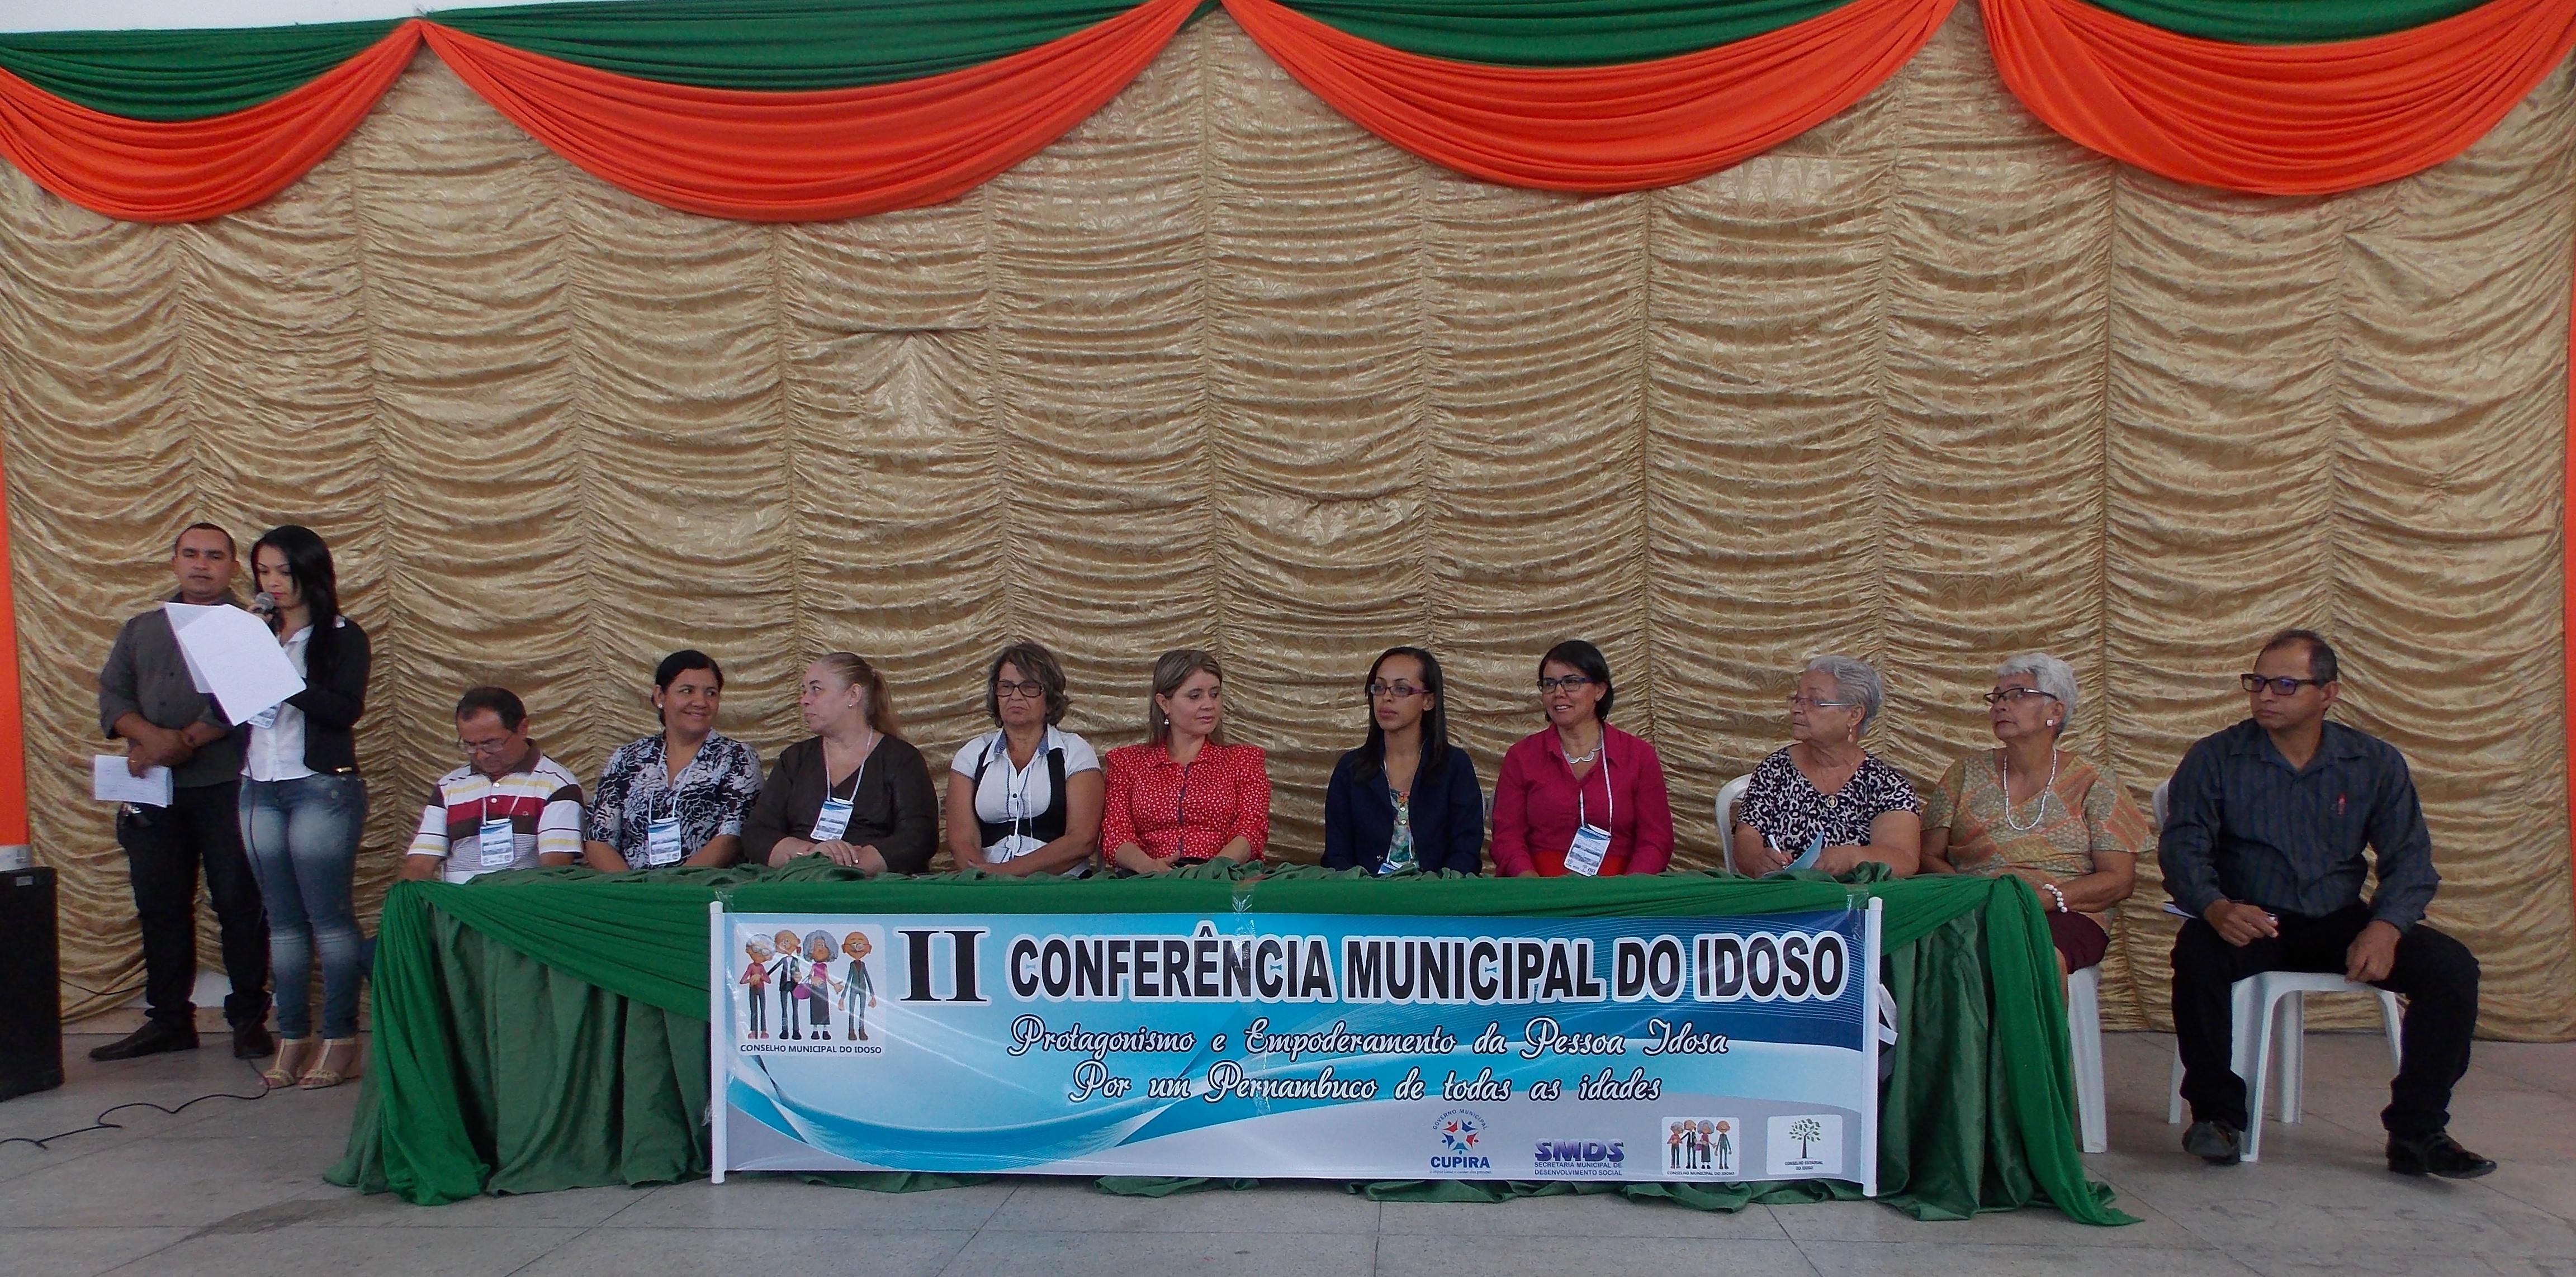 Mesa de representantes do  CCI, convidados e autoridades (Foto:Adelino Silva - Ascom/PMC)